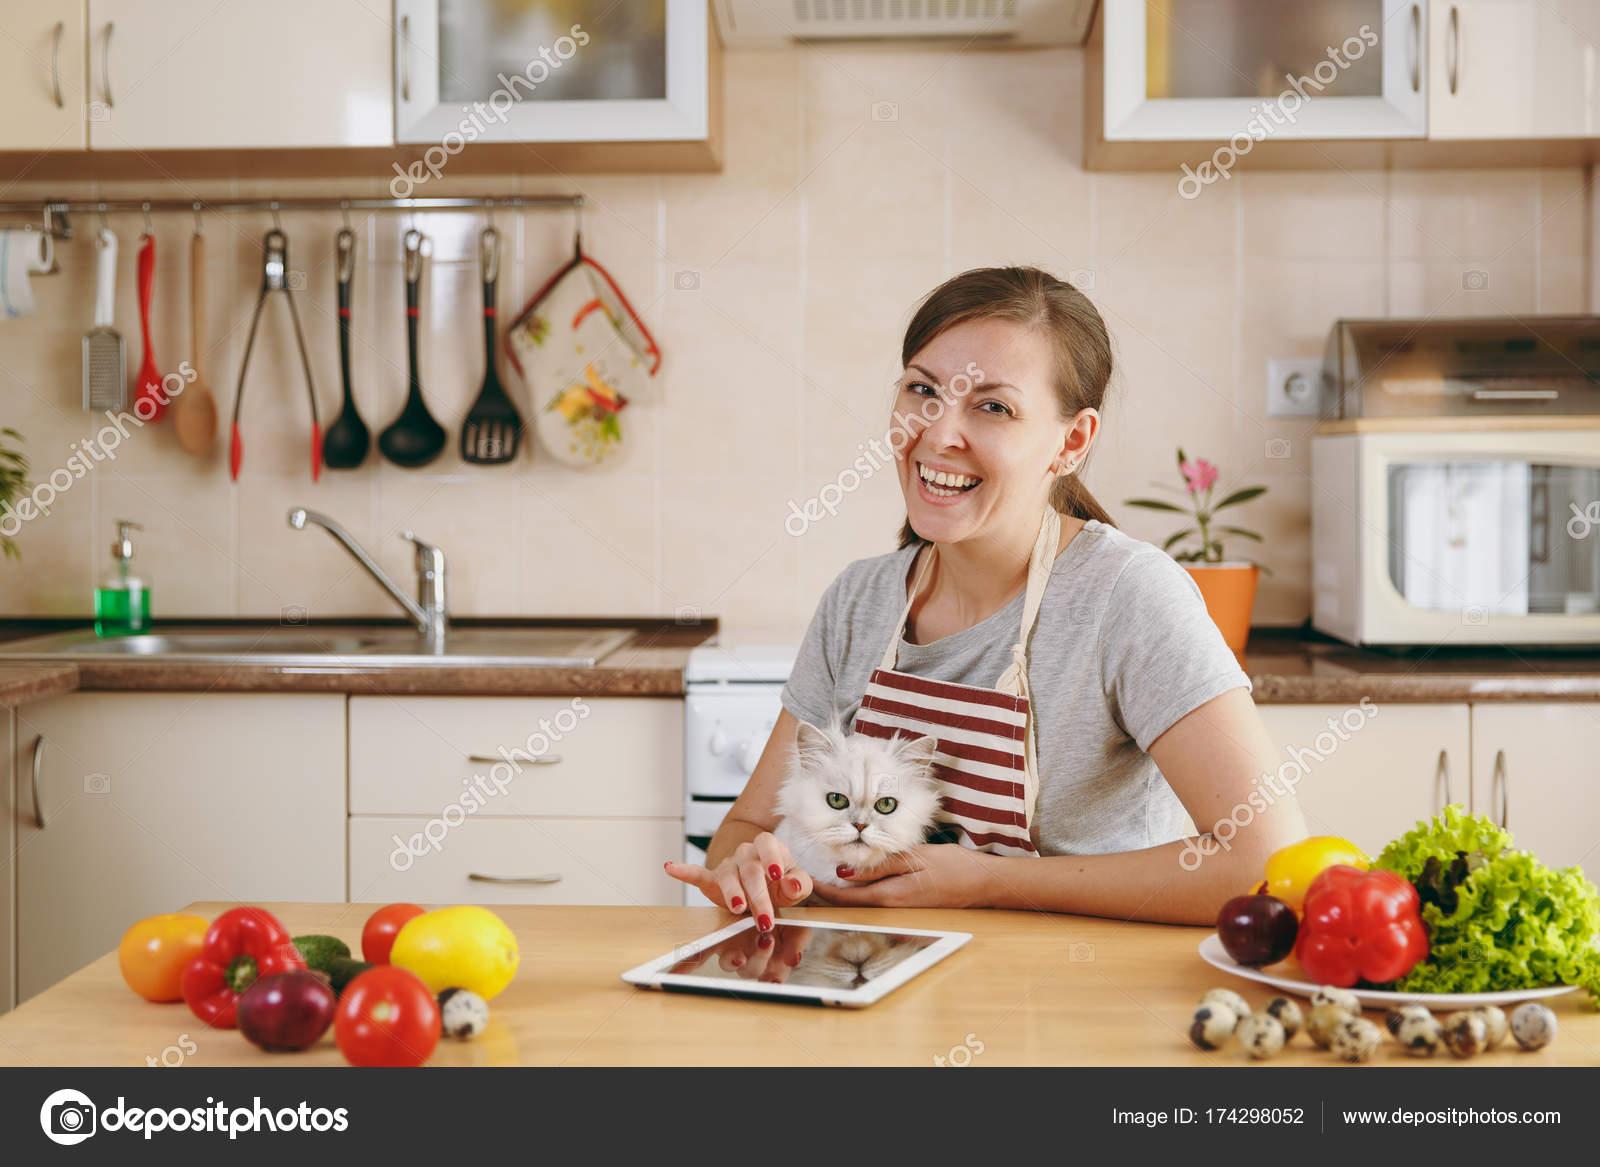 nice kitchen tables four hole faucets 一个年轻漂亮的女人与白色的波斯猫在厨房与片剂在桌子上 蔬菜沙拉 节食 那个年轻漂亮的女人带着白色的波斯猫在厨房里 桌子上放着平板电脑 节食概念 健康的生活方式 在家做饭